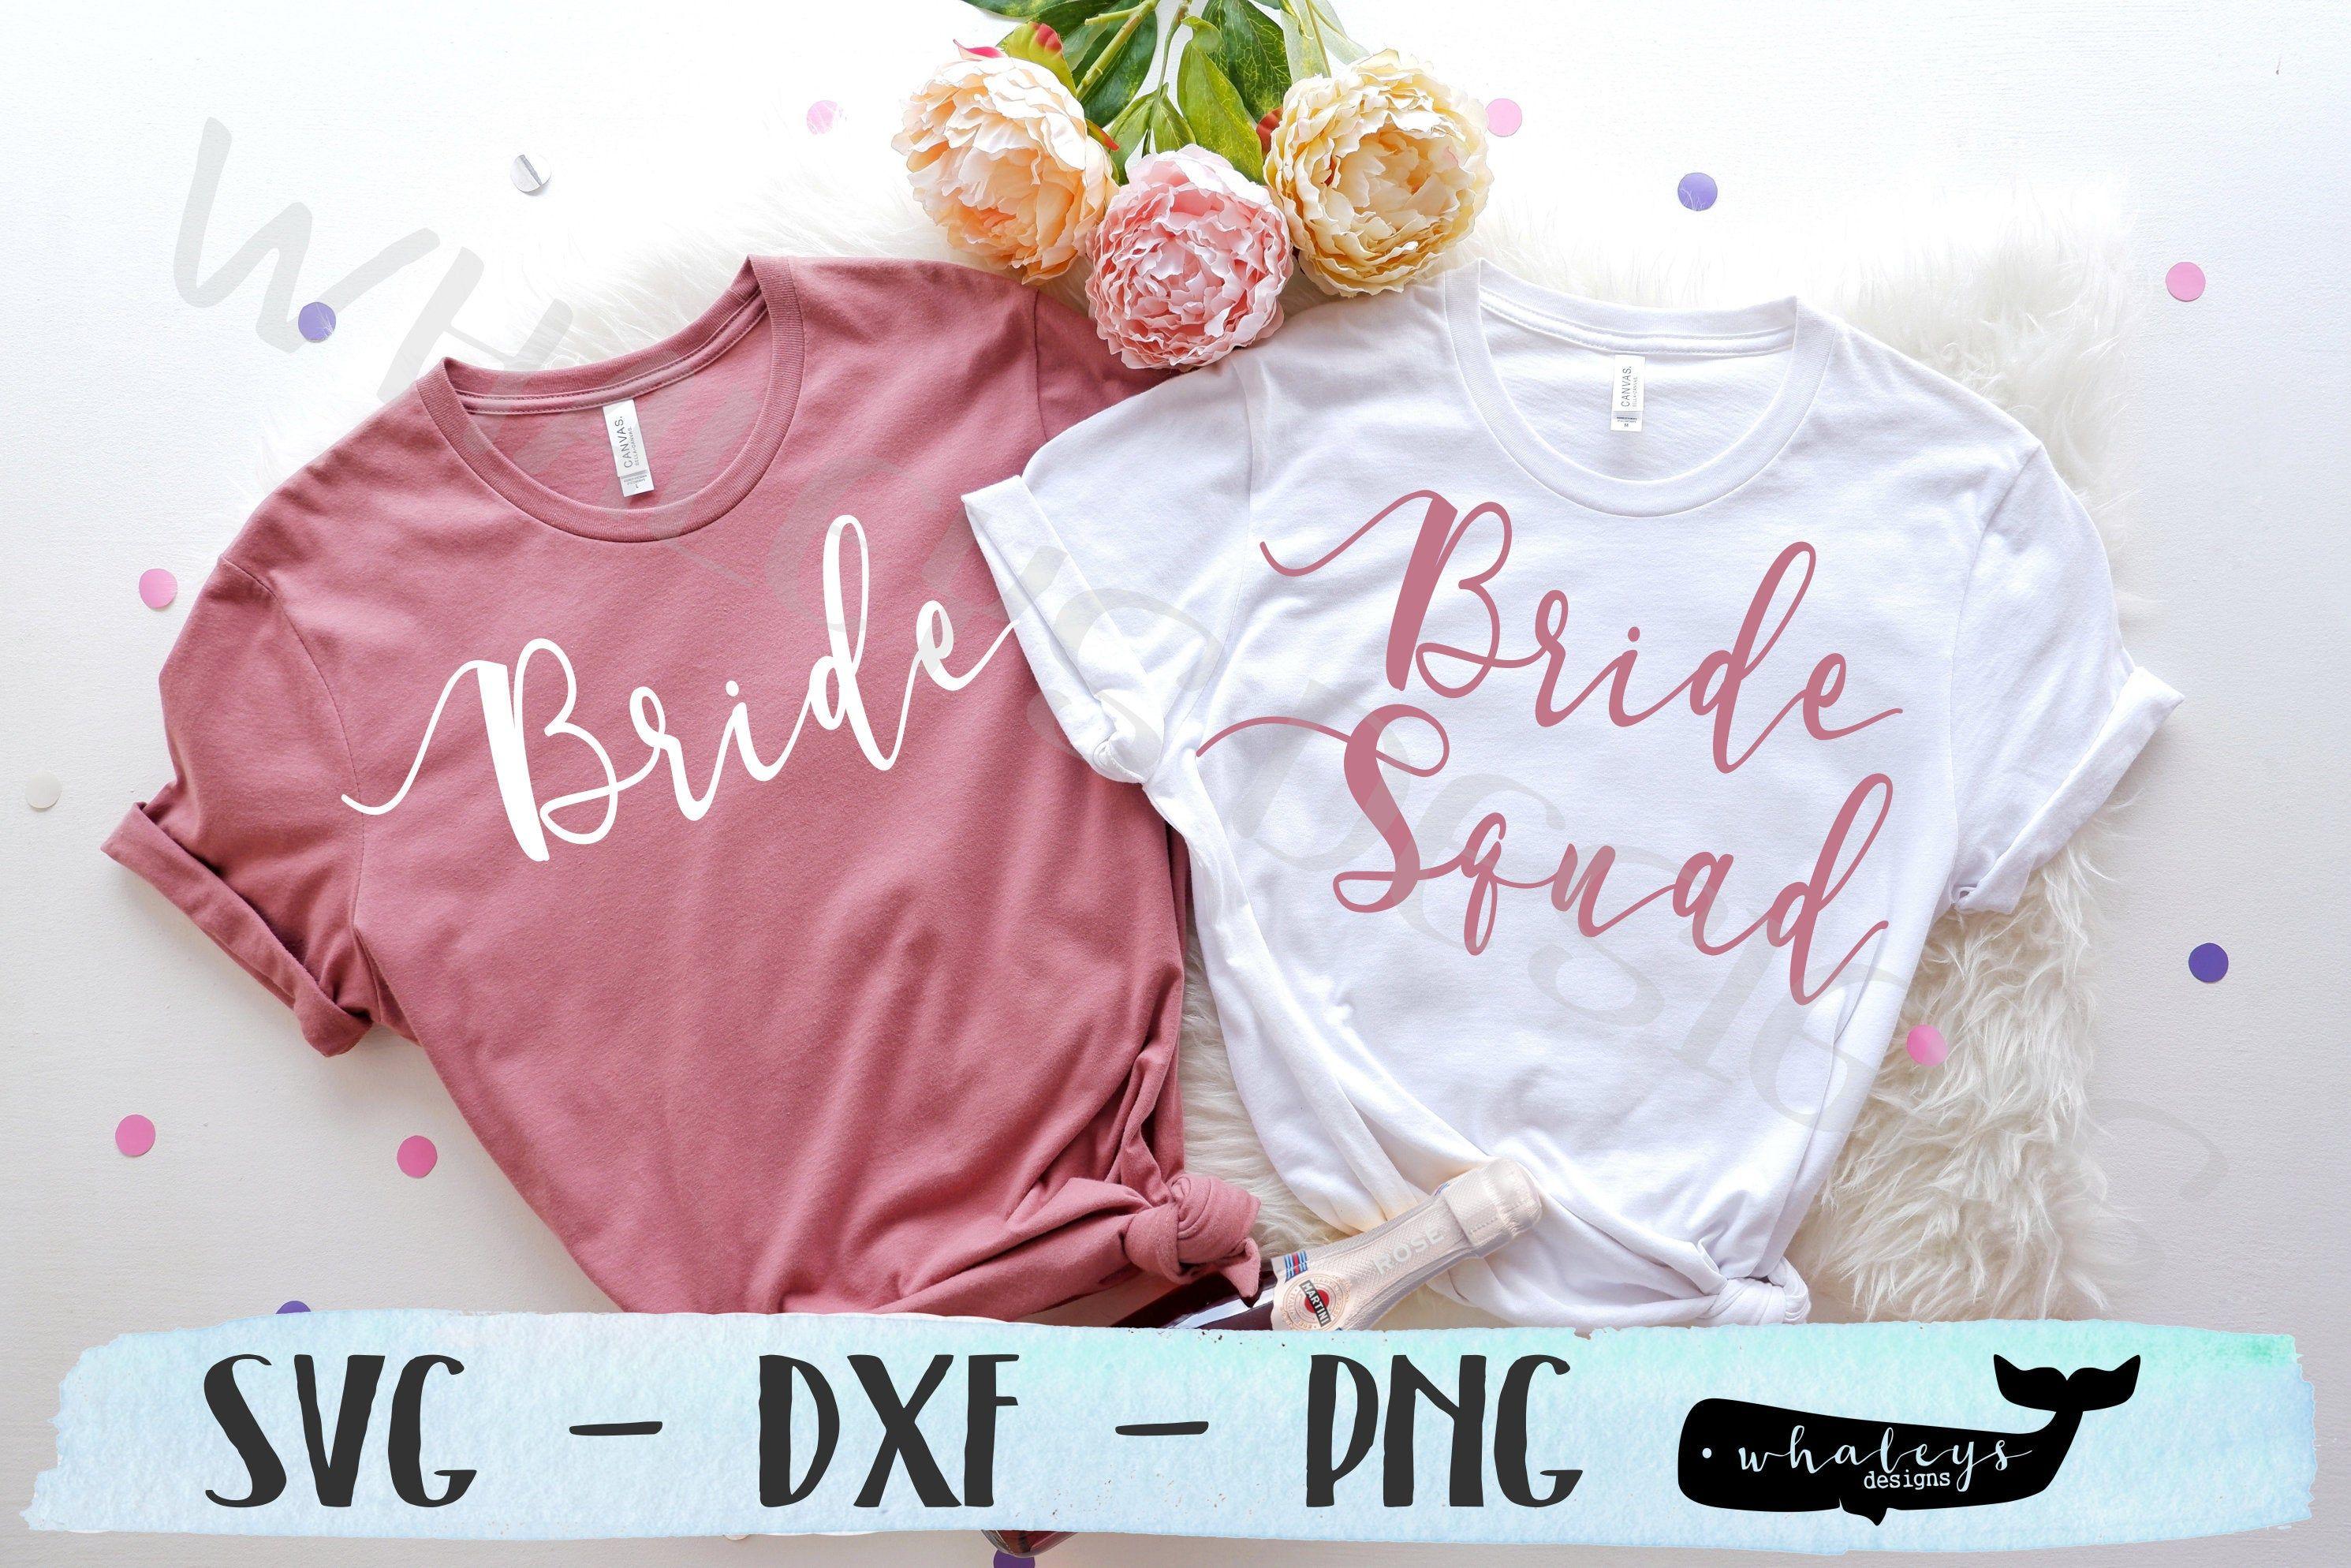 Bride Svg Bride Squad Dxf Bachelorette Png Party Vector Etsy In 2020 Bride Tribe Bachelorette Wedding Clip